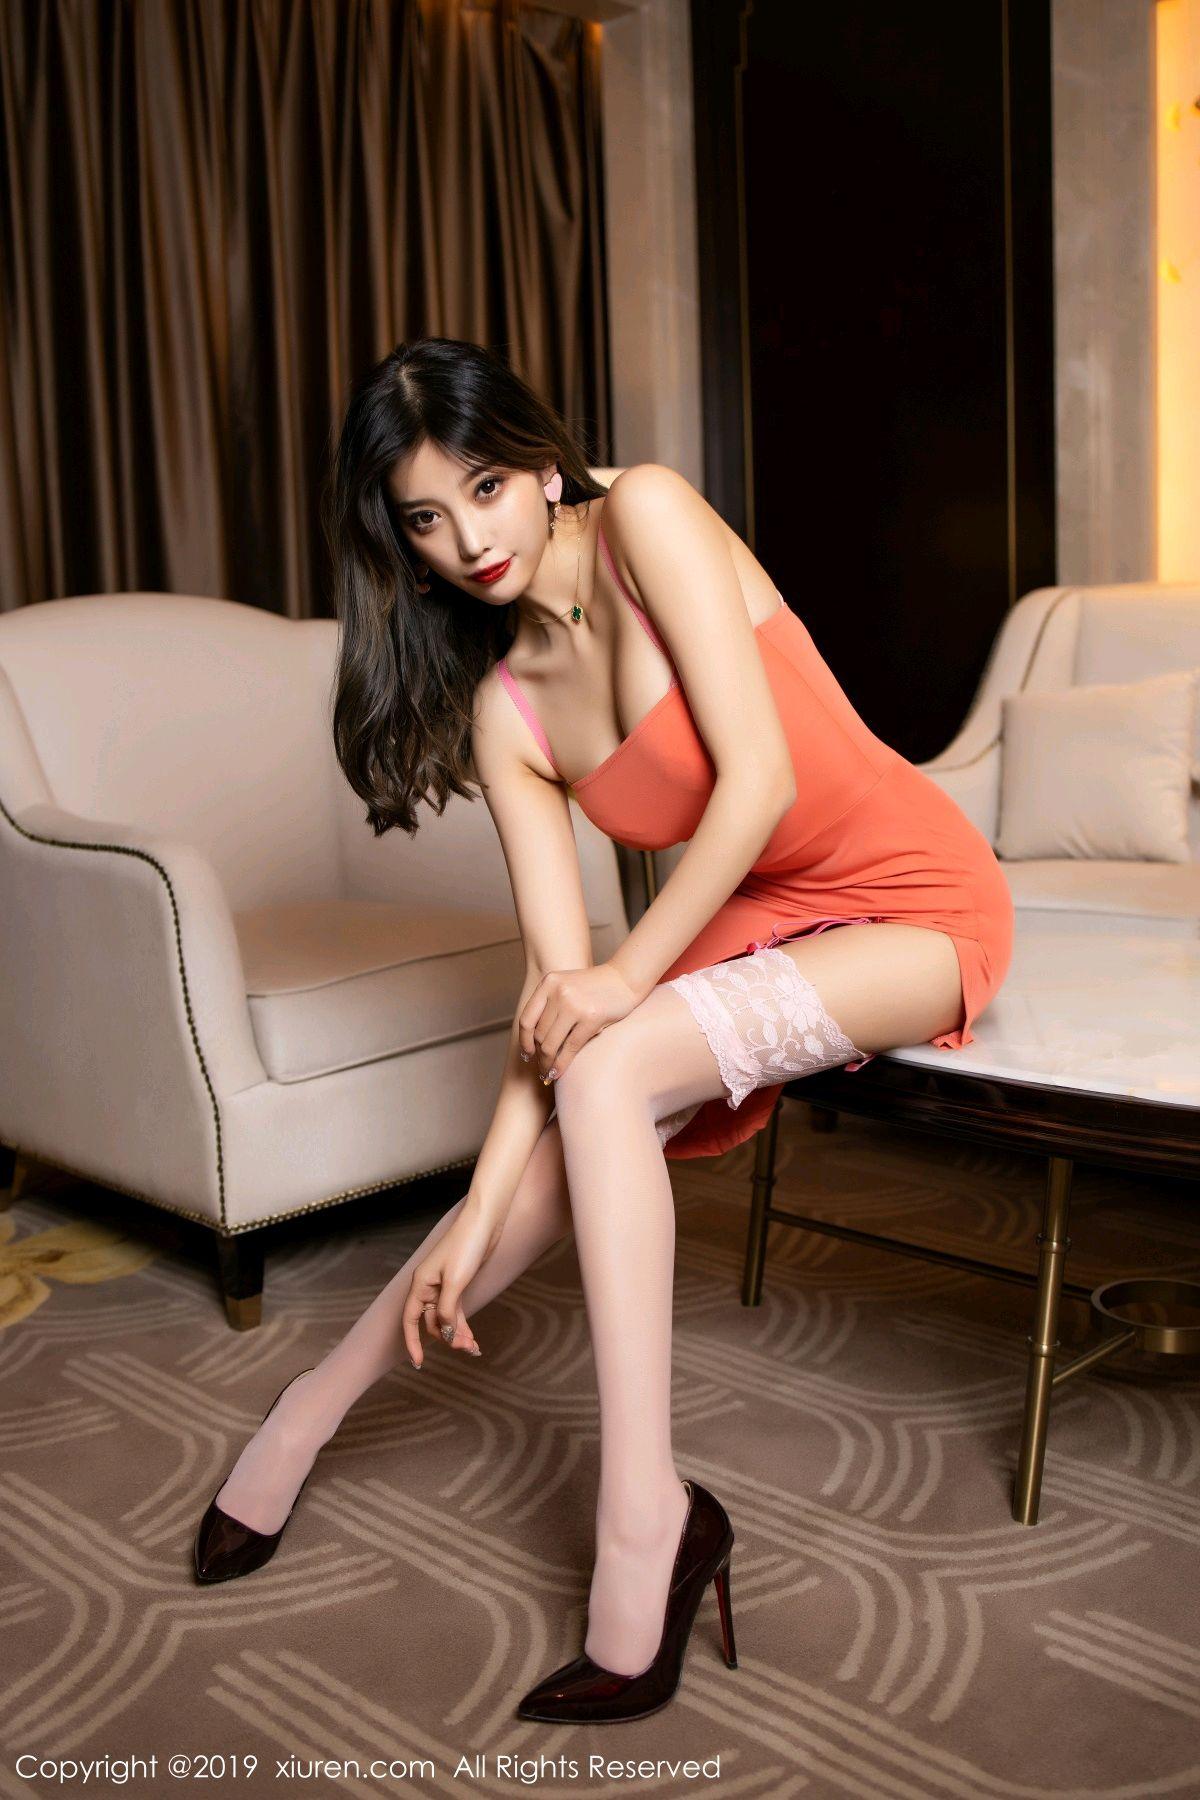 [XiuRen] Vol.1582 Yang Chen Chen 11P, Black Silk, Tall, Temperament, Xiuren, Yang Chen Chen